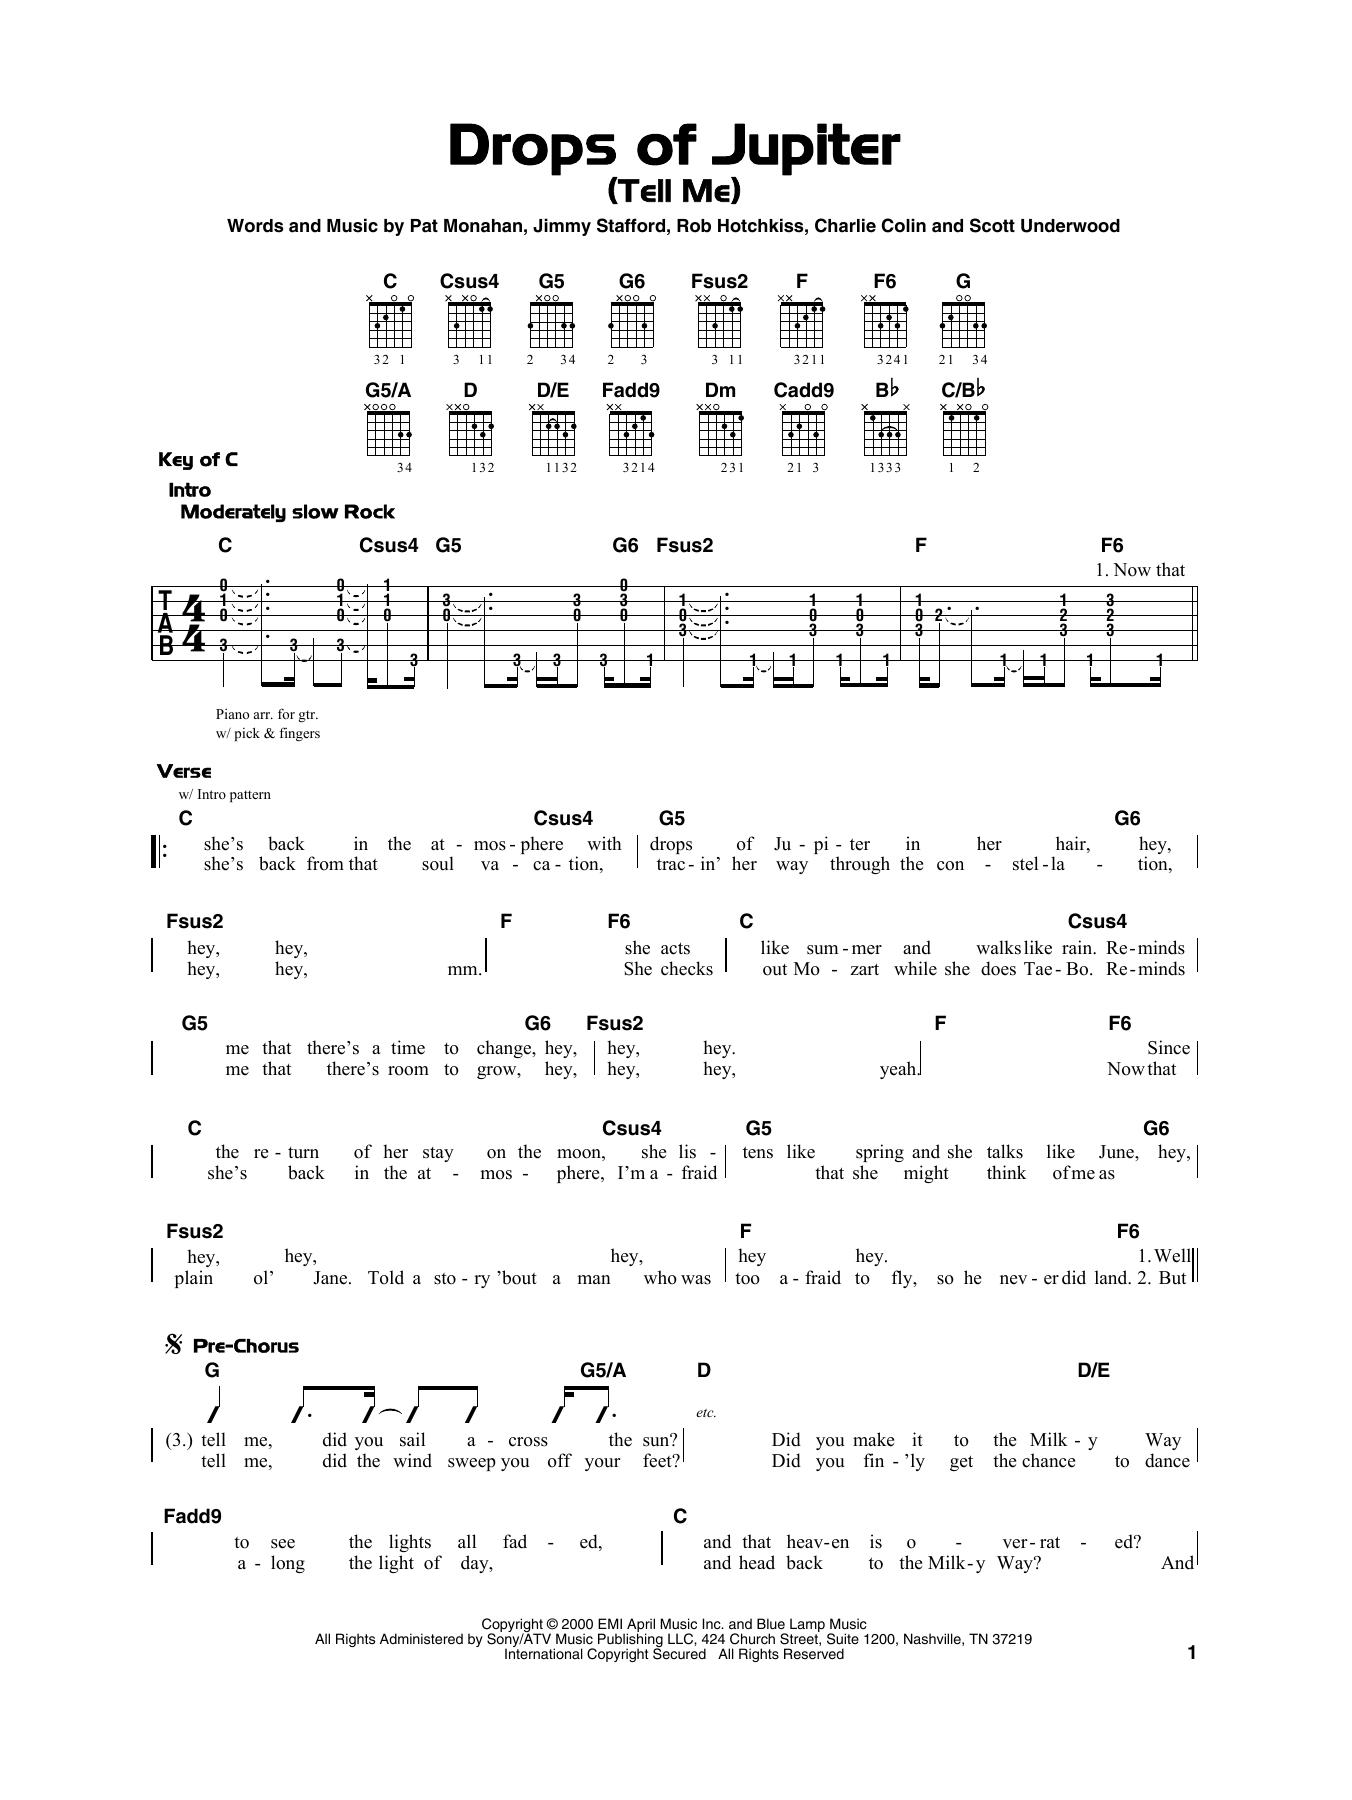 Drops Of Jupiter Chords Train Drops Of Jupiter Tell Me Sheet Music Notes Chords Download Printable Really Easy Guitar Sku 415304